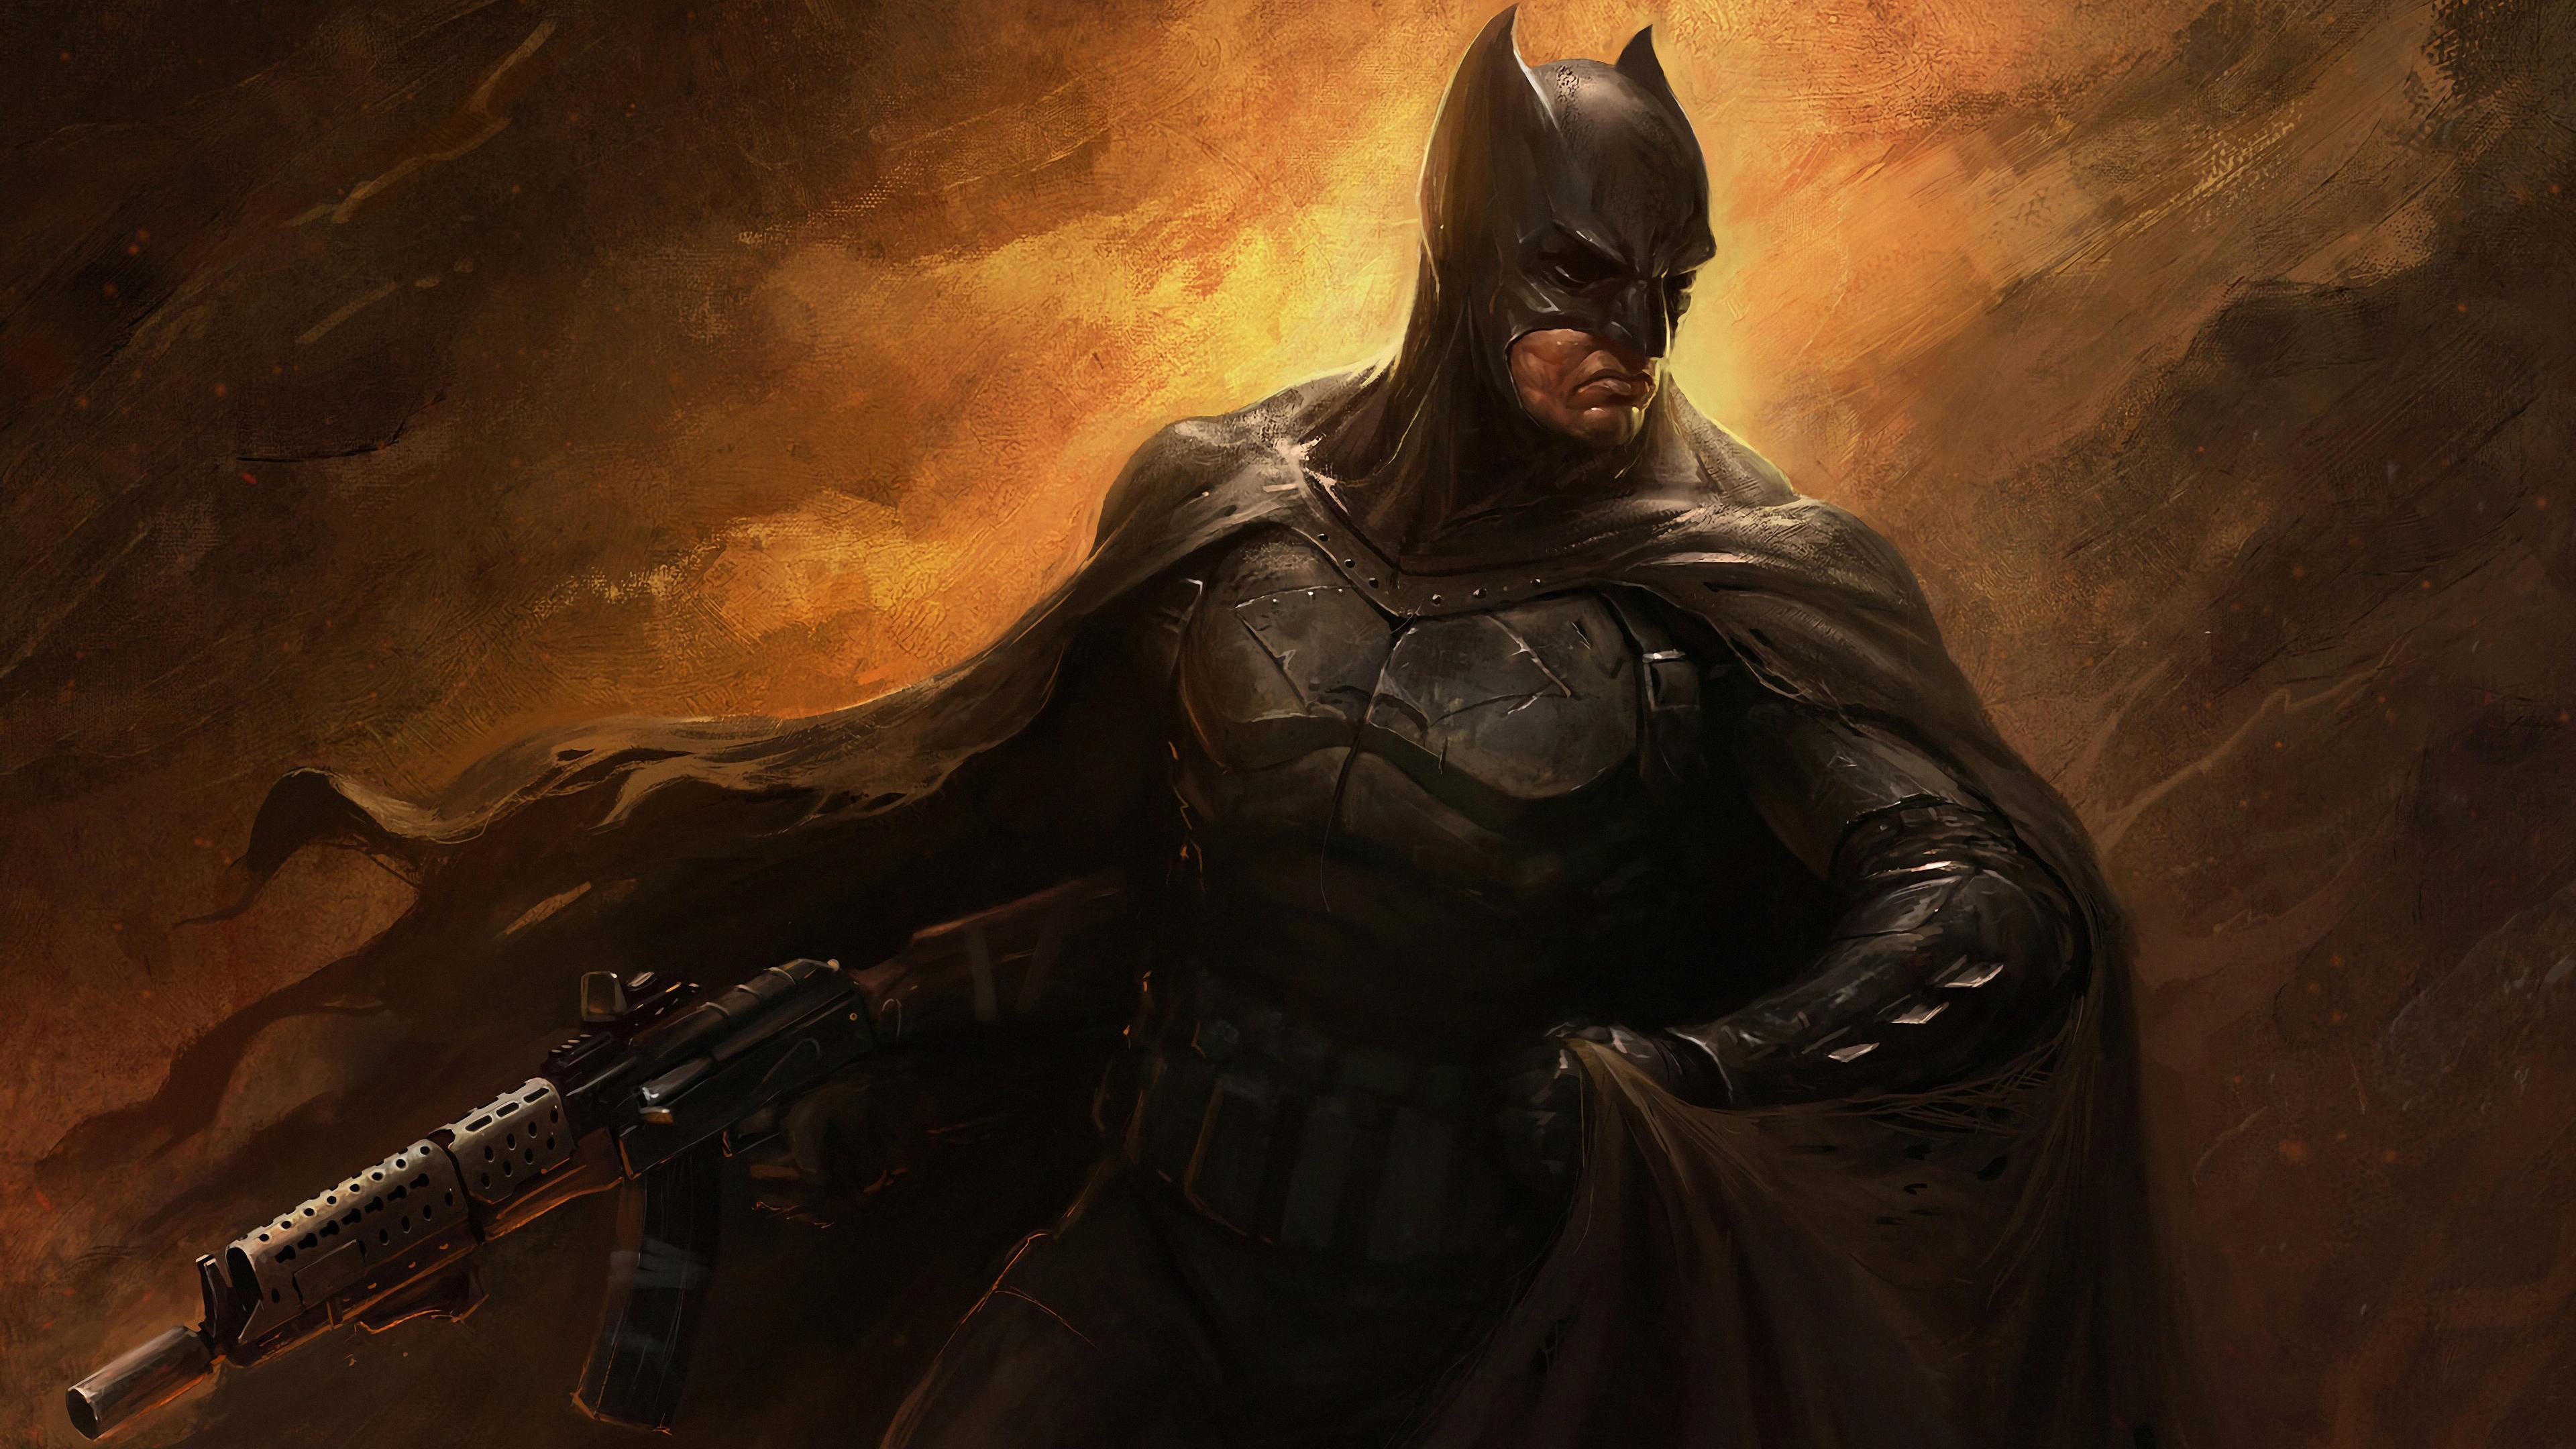 batman with gun 1569186347 - Batman With Gun - superheroes wallpapers, hd-wallpapers, digital art wallpapers, batman wallpapers, artwork wallpapers, artstation wallpapers, 4k-wallpapers